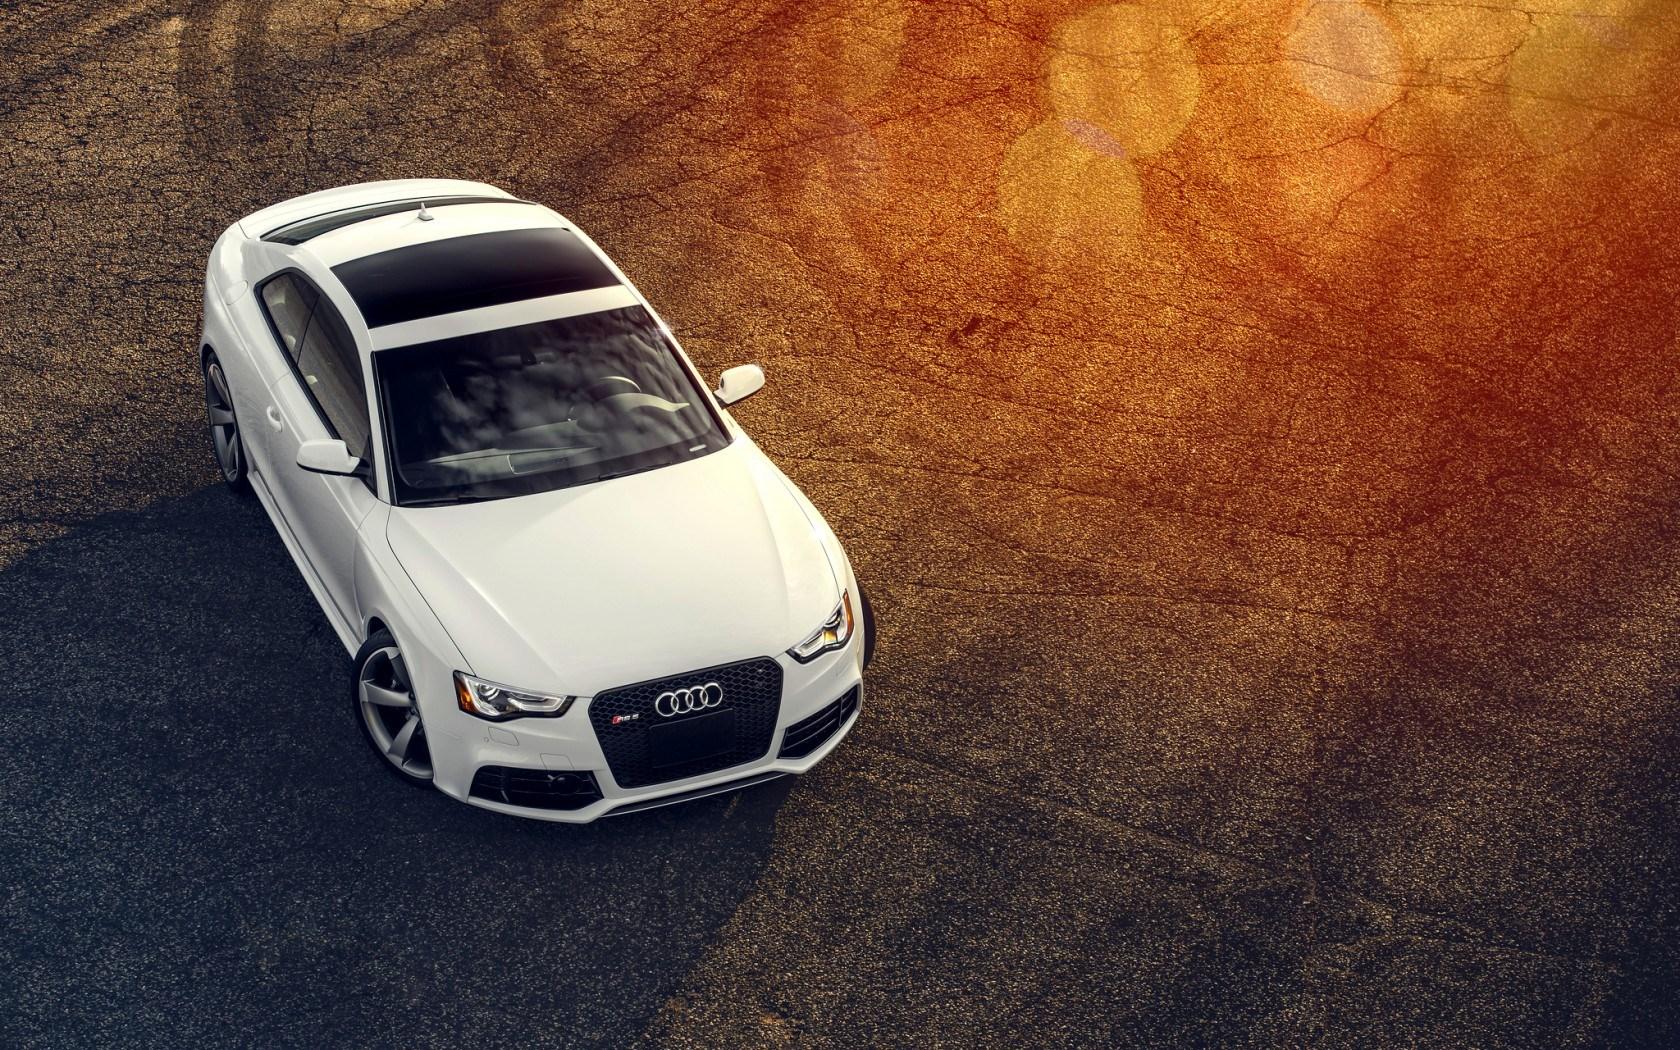 Audi RS5 White Car